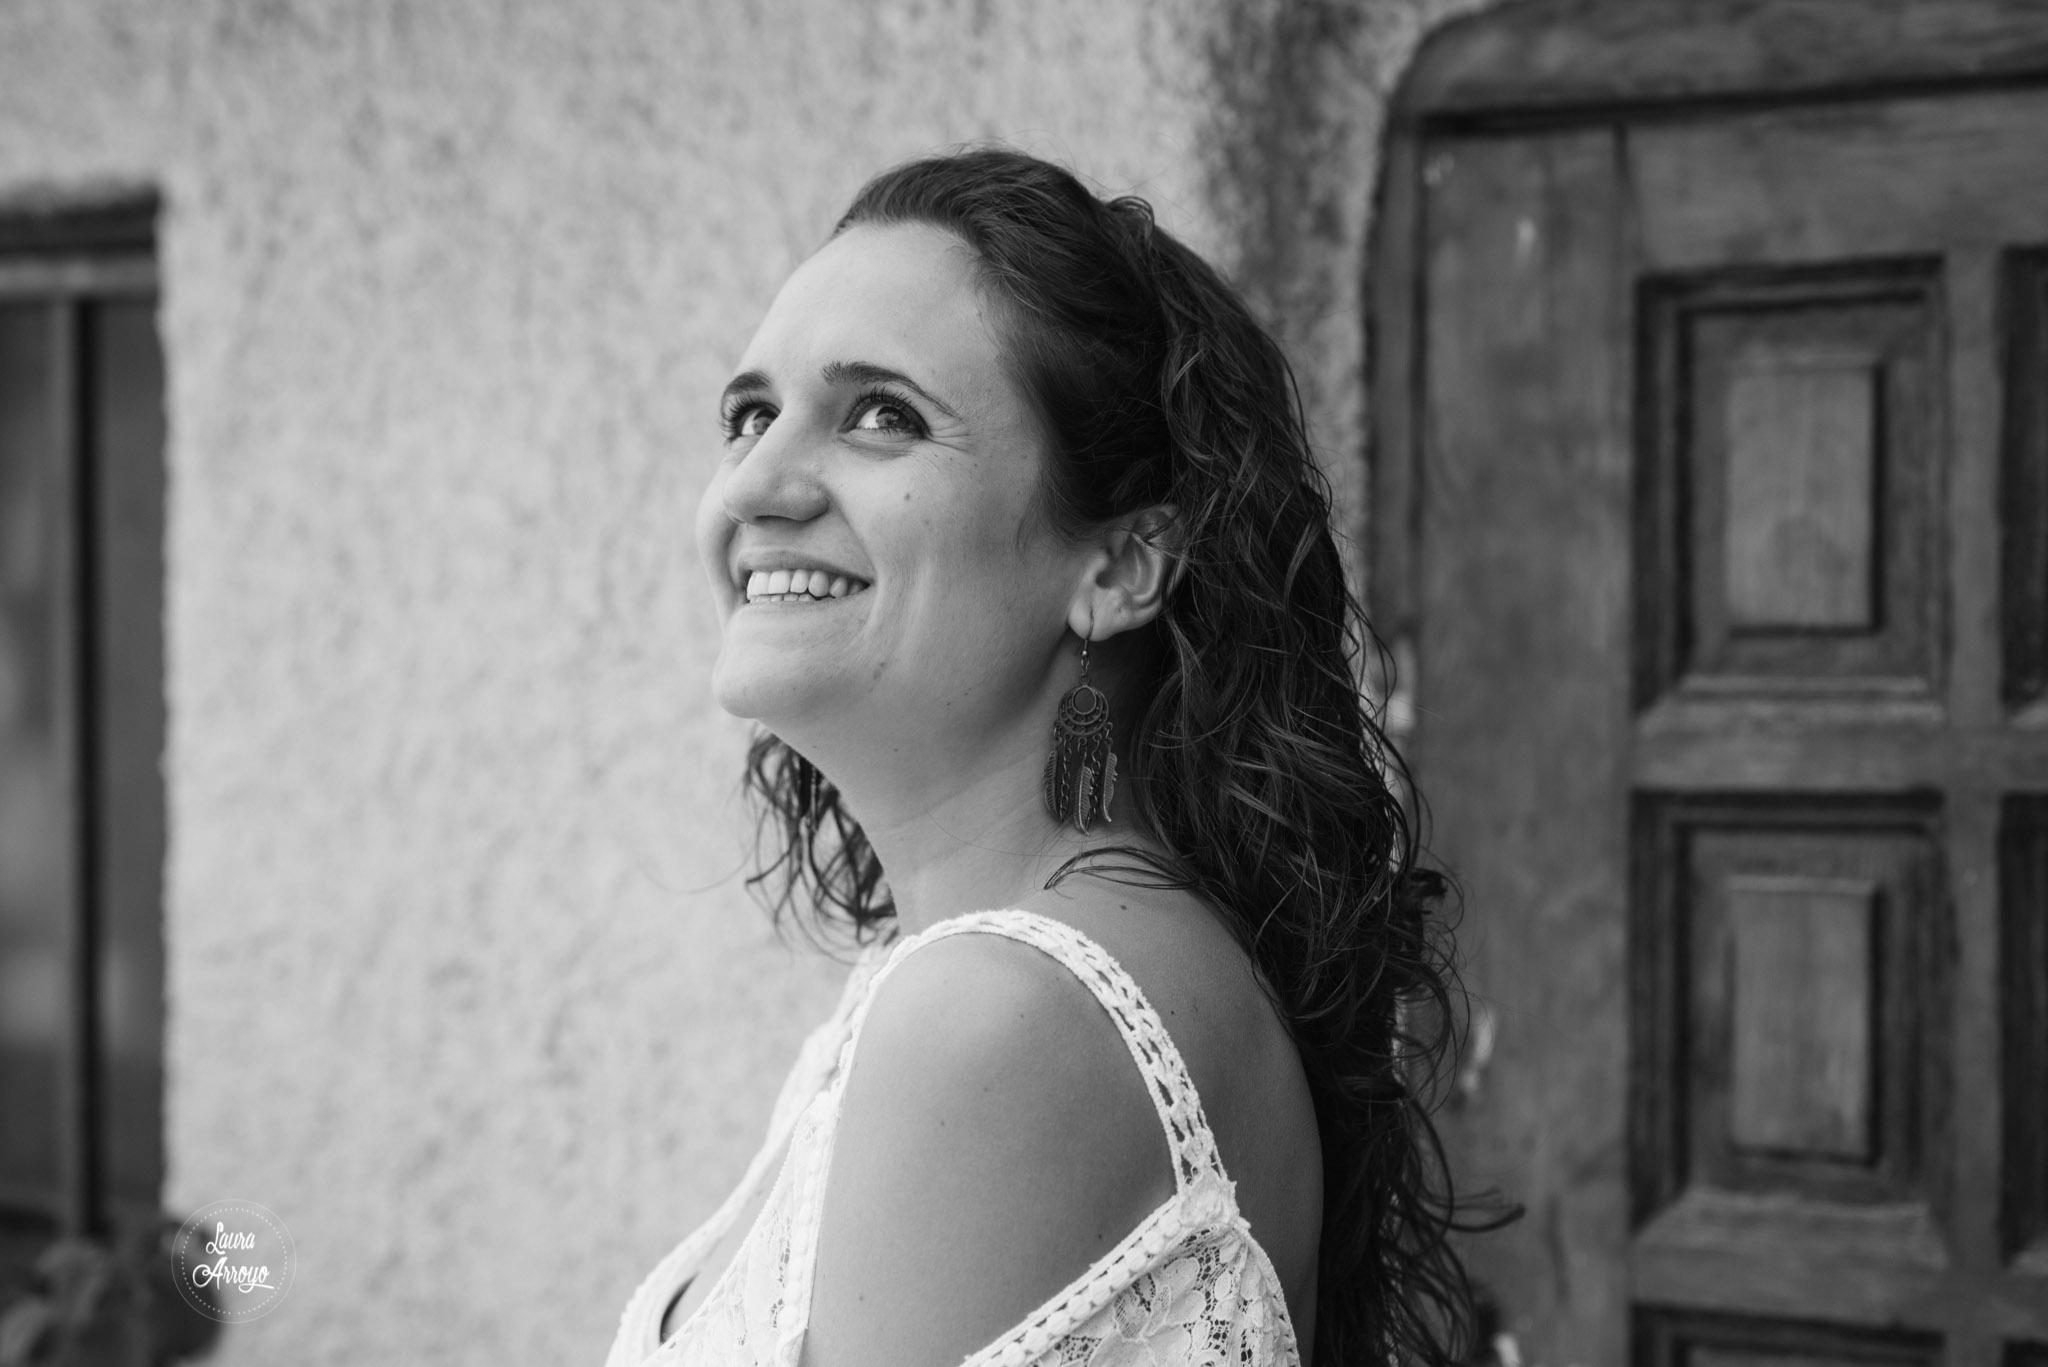 Laura_Arroyo_preboda_-Roc de Sant Gaieta - Tarragona-Fotoperiodismo_de_boda_8529